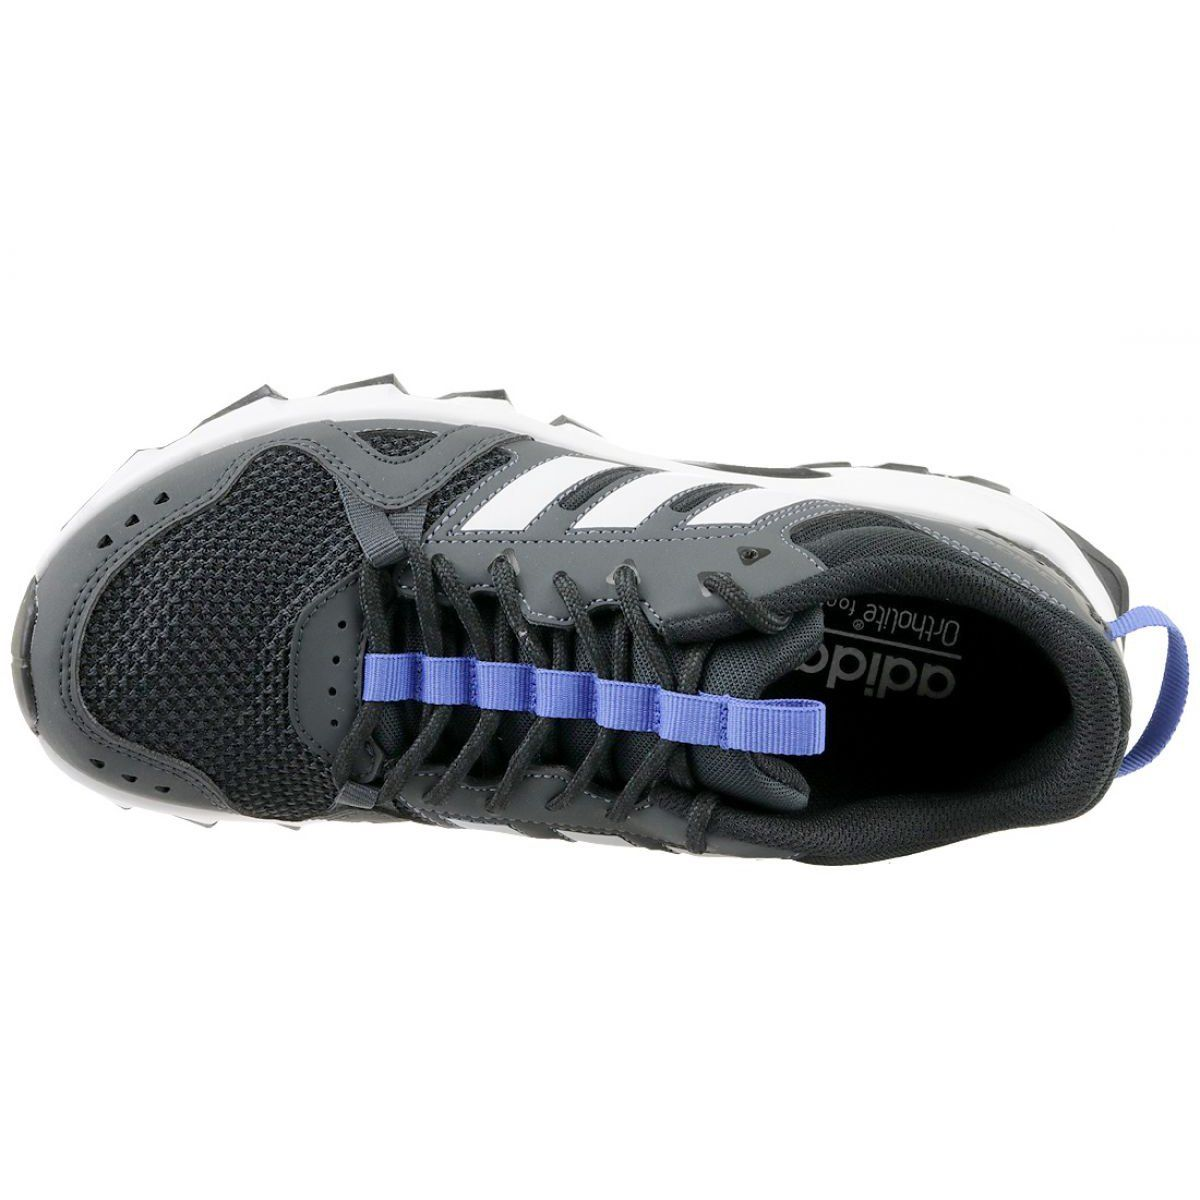 Adidas Rockadia Trail M Cm7212 Shoes Grey Adidas Brand Adidas Running Shoes Shoes